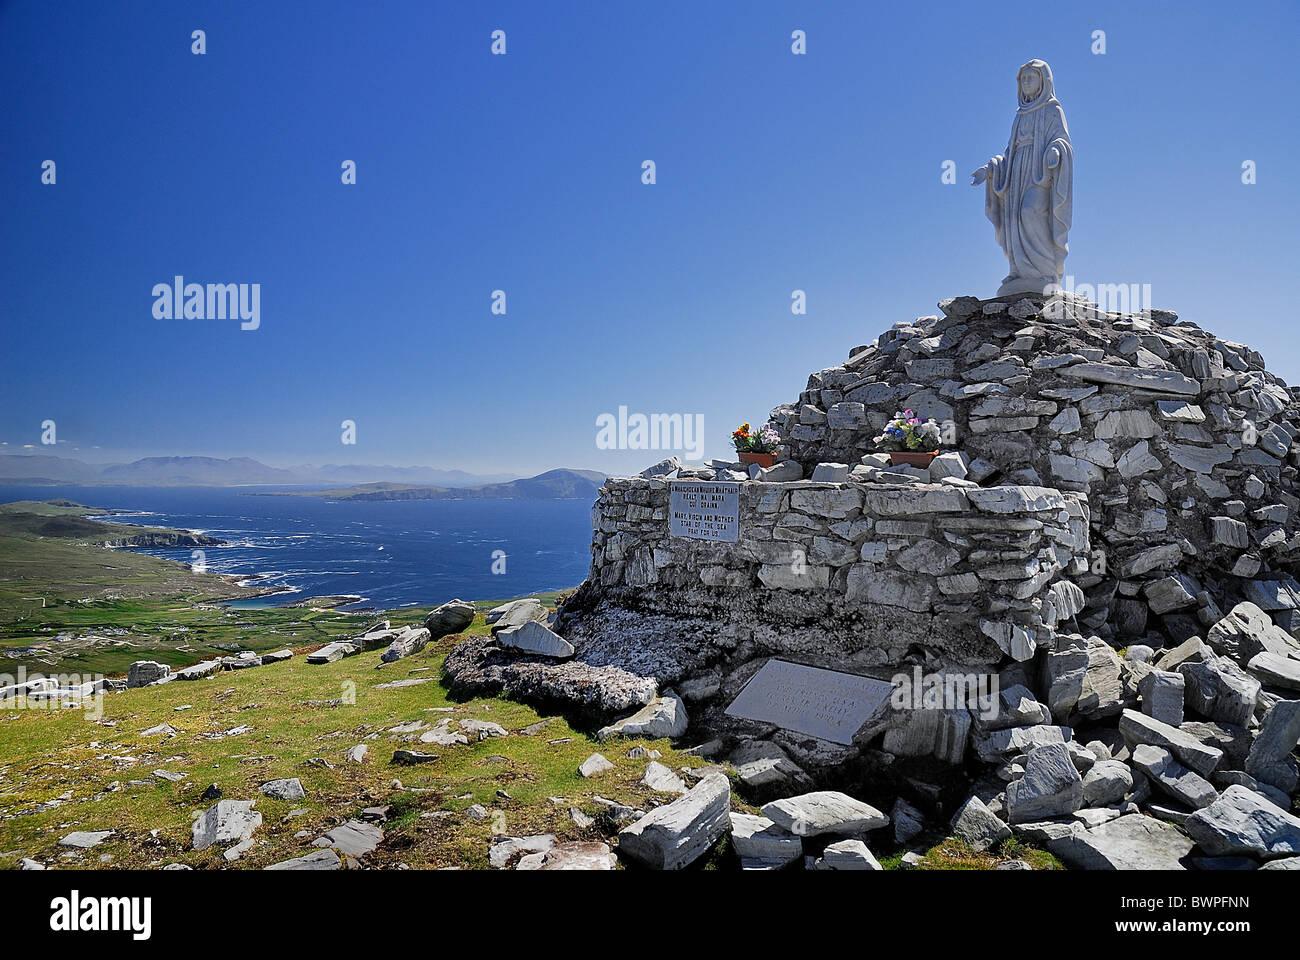 IRELAND County Mayo Achill Island - Stock Image